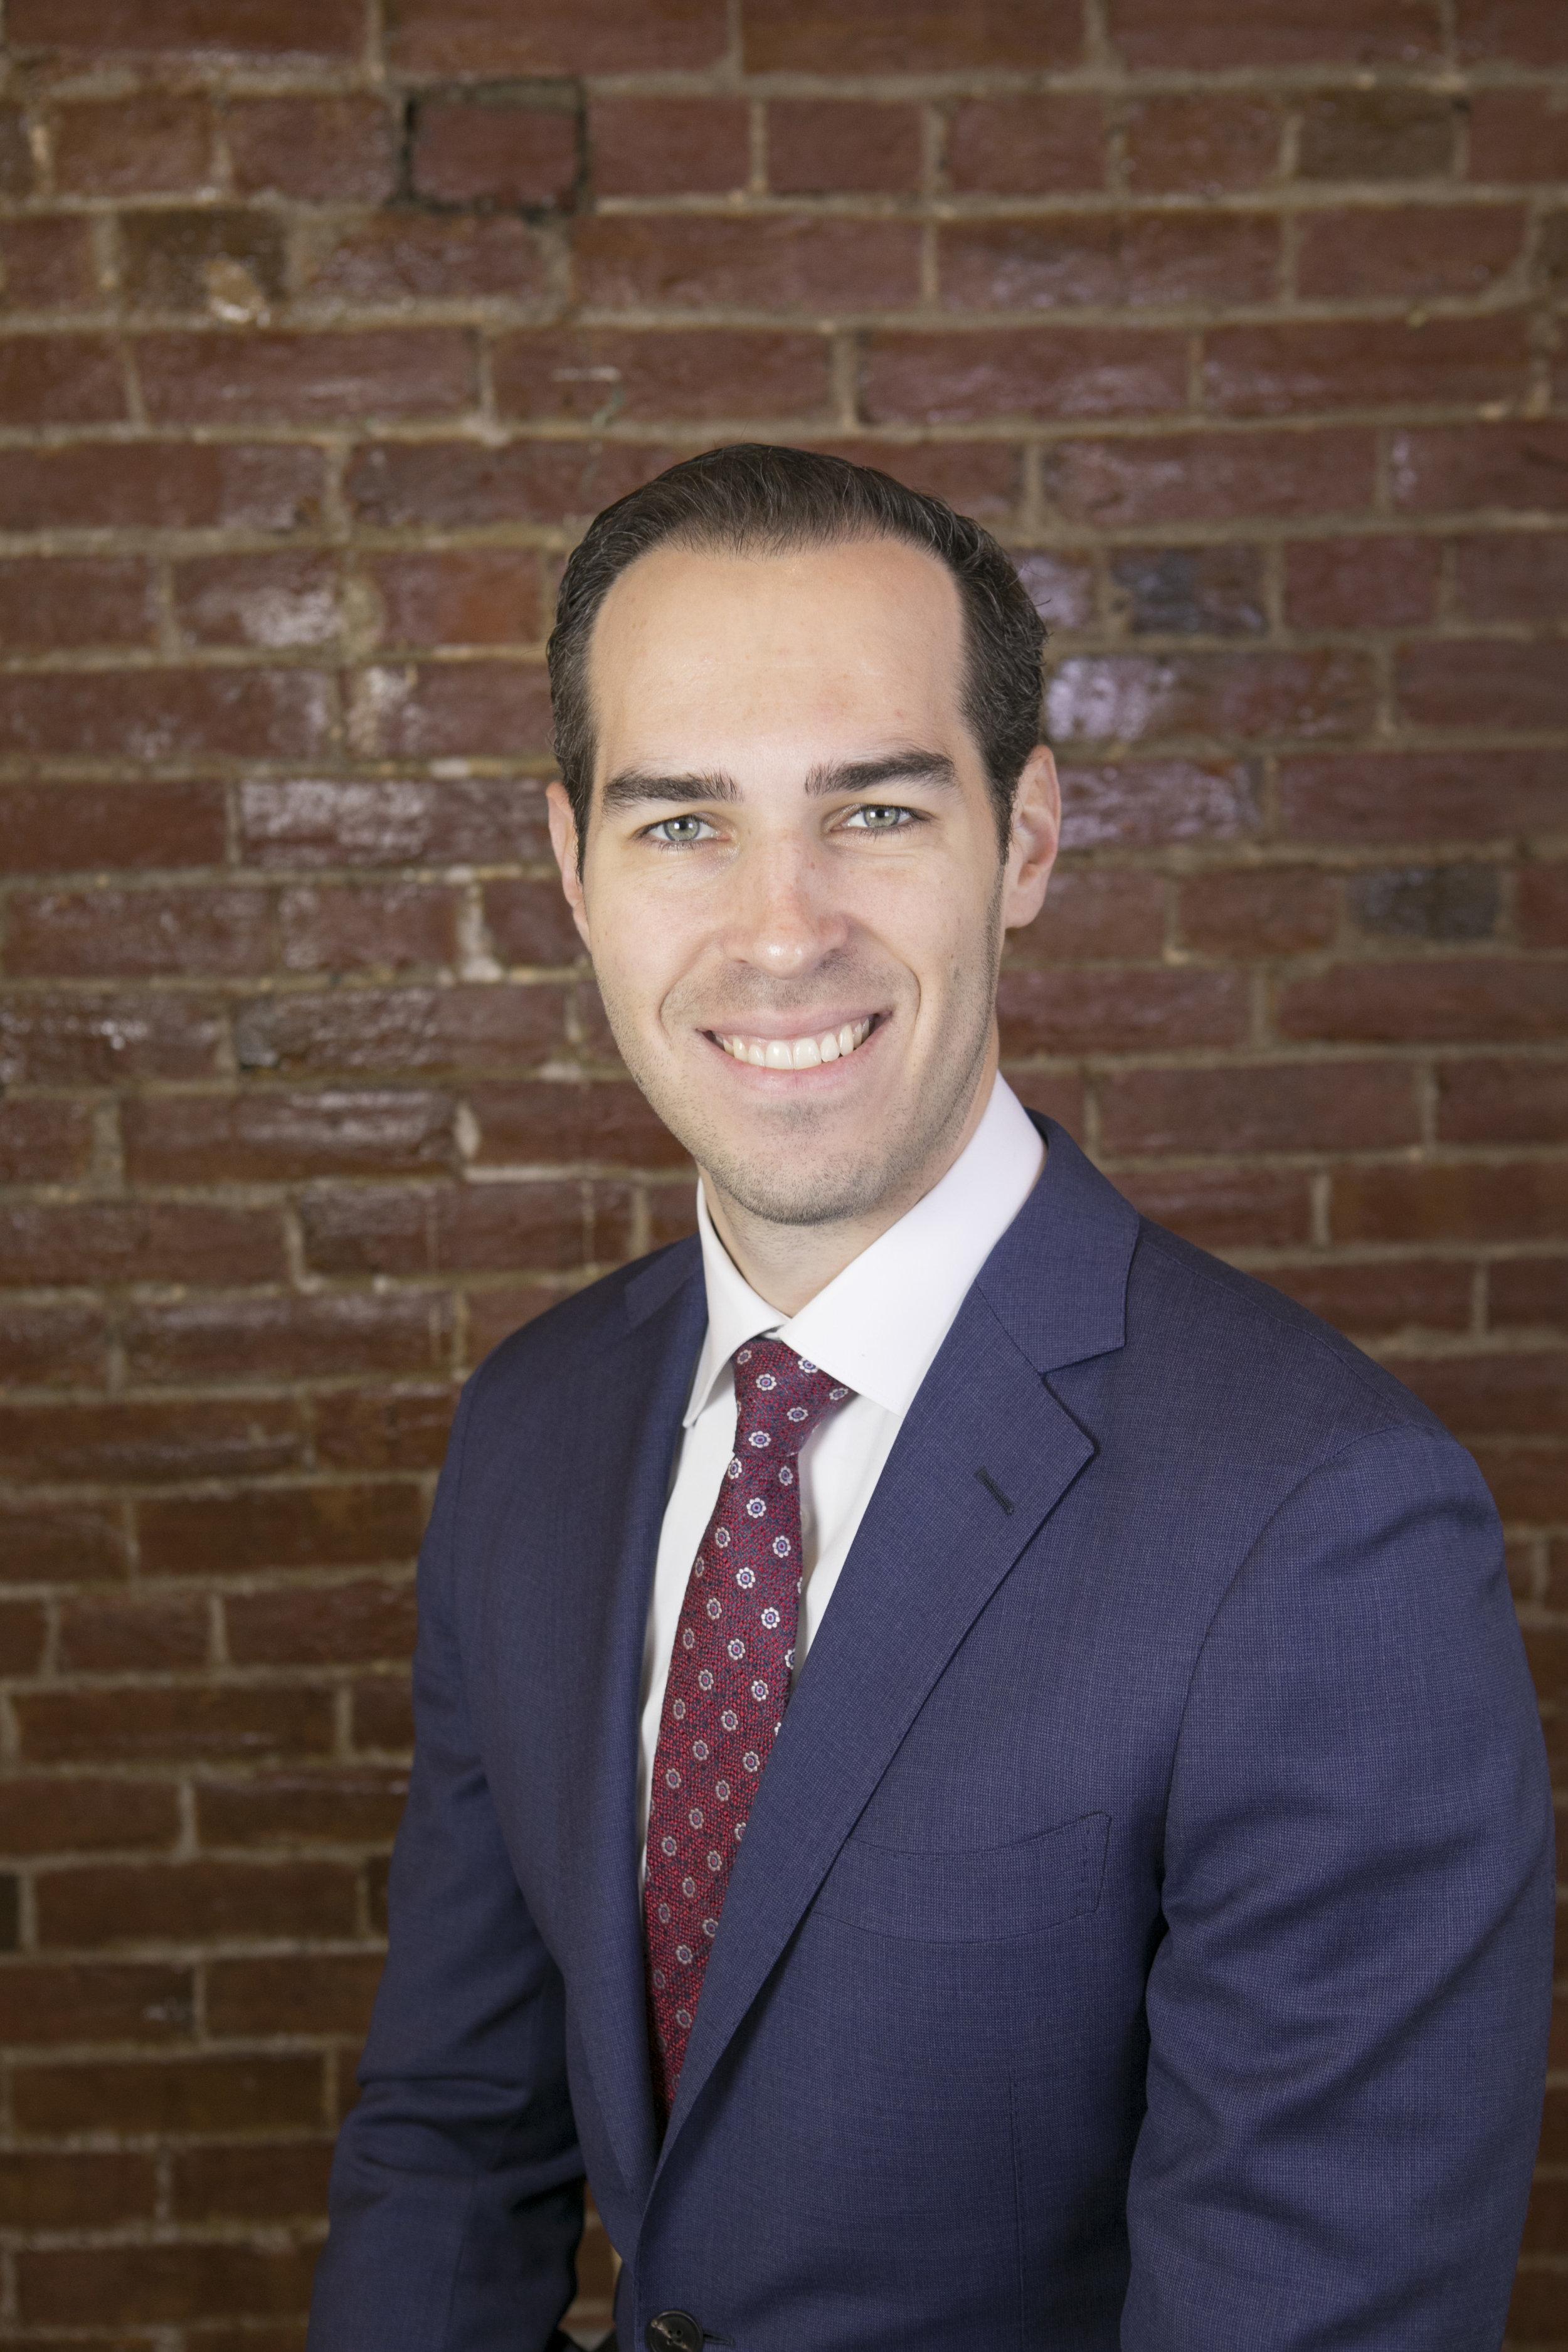 David Carney, Esq. | Licensed Vaccine Attorney